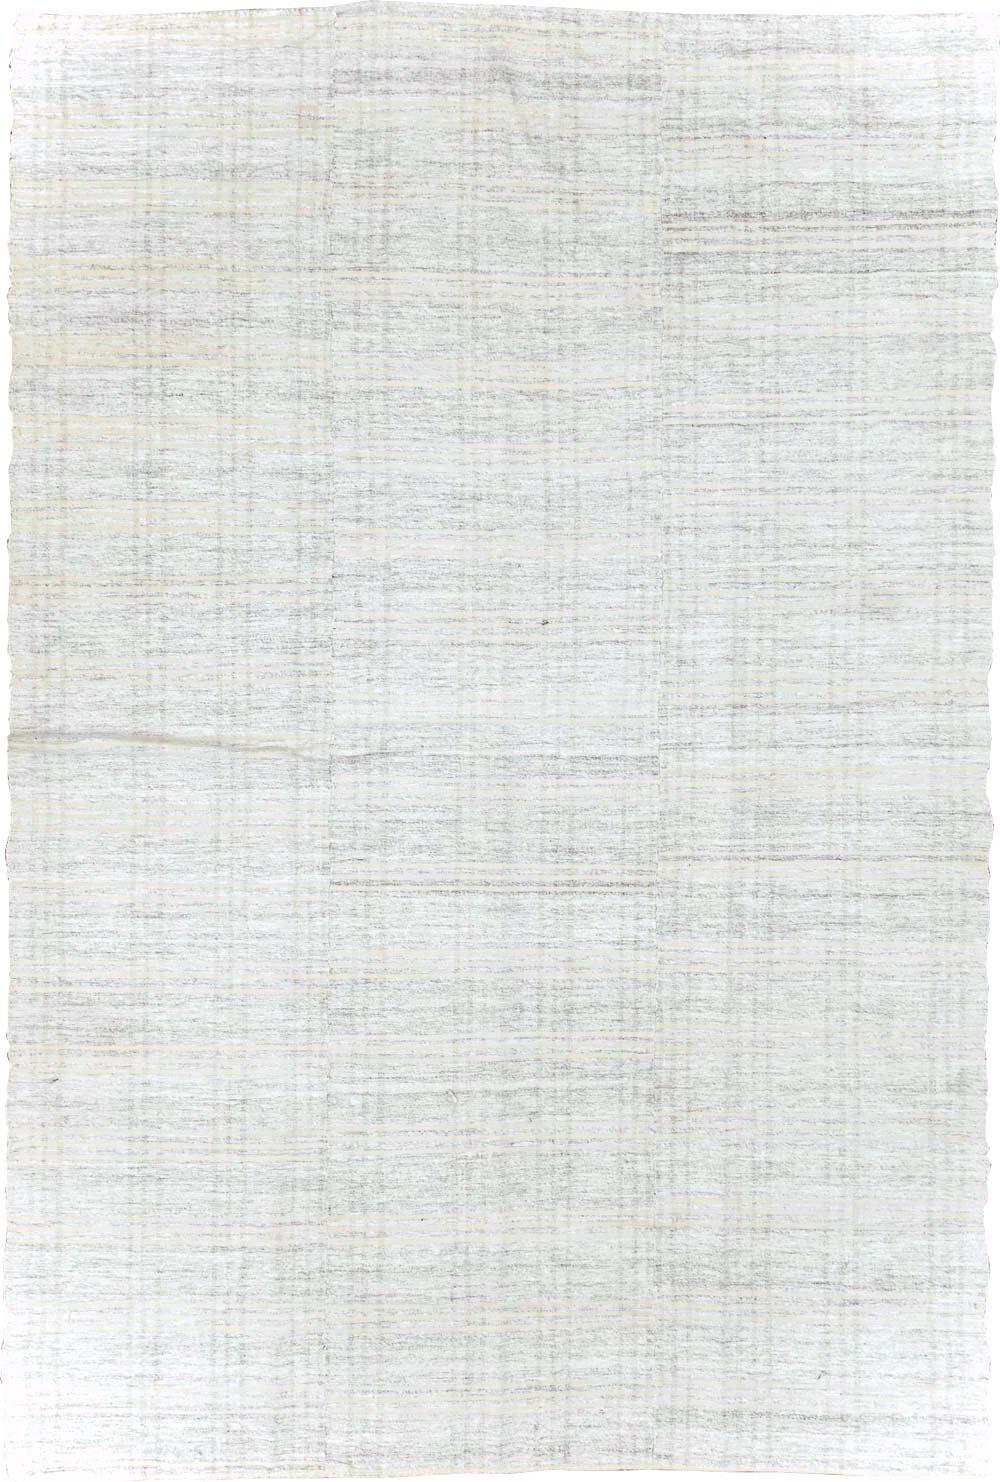 Vintage Turkish Flatweave Kilim Accent Rug, No.29483 - Galerie Shabab